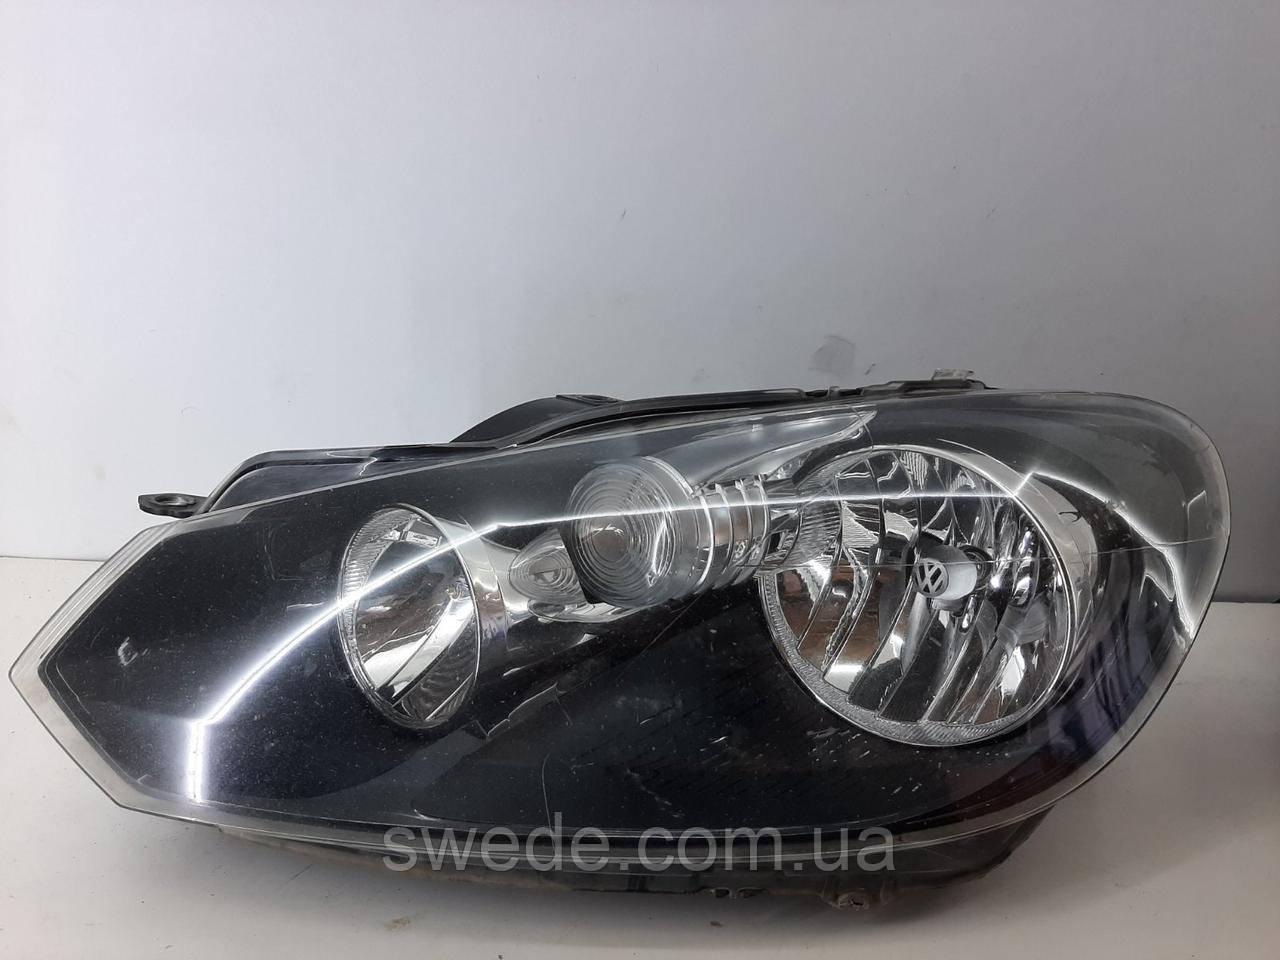 Фара левая Volkswagen Golf 6 2009-2014 гг 5K1941005J